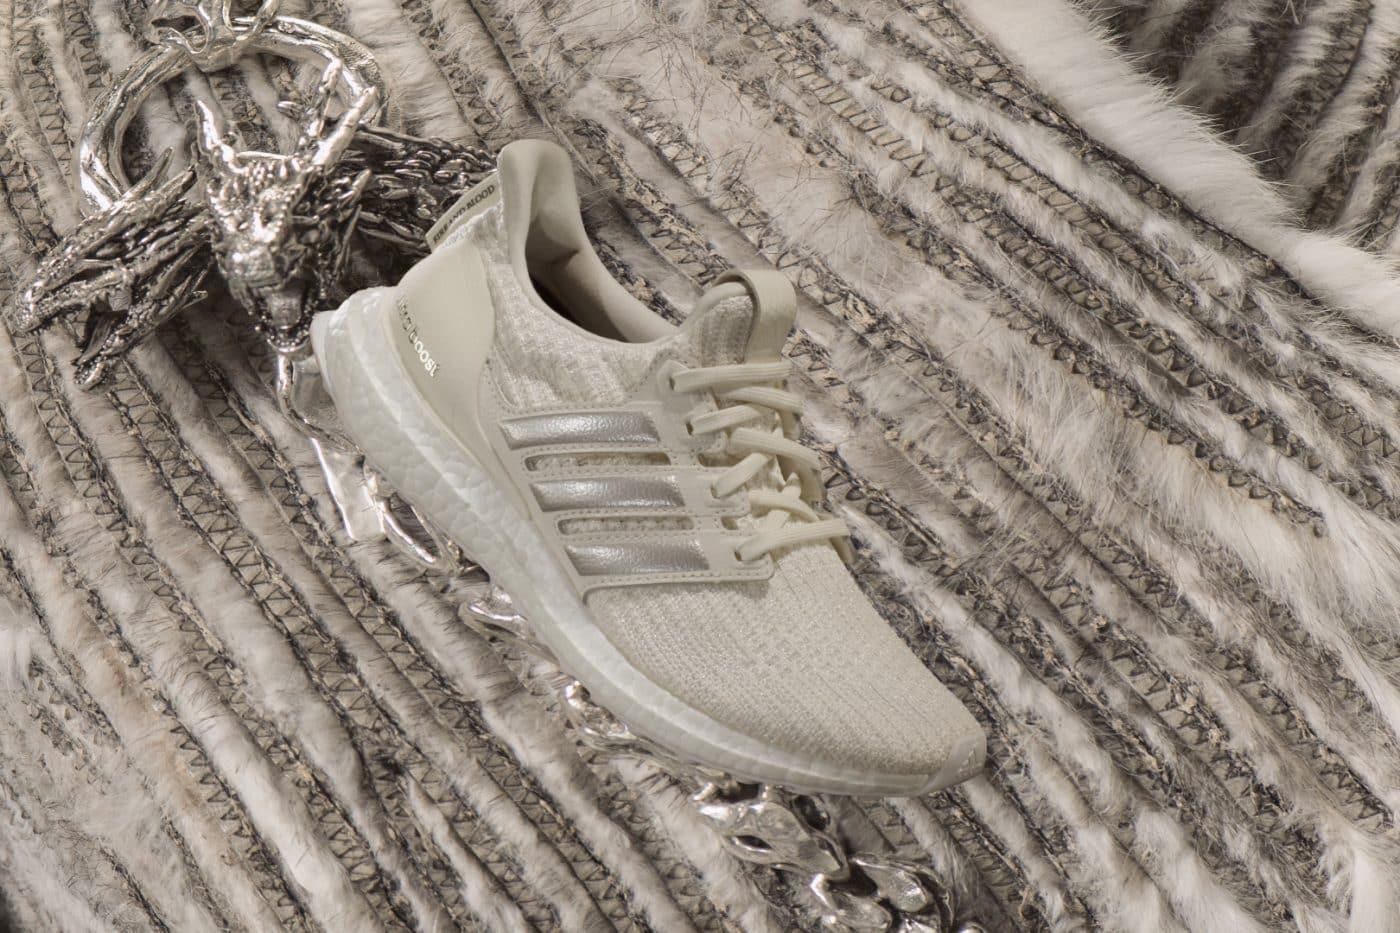 ultraboost-19-adidas-game-of-thrones-targaryen-w